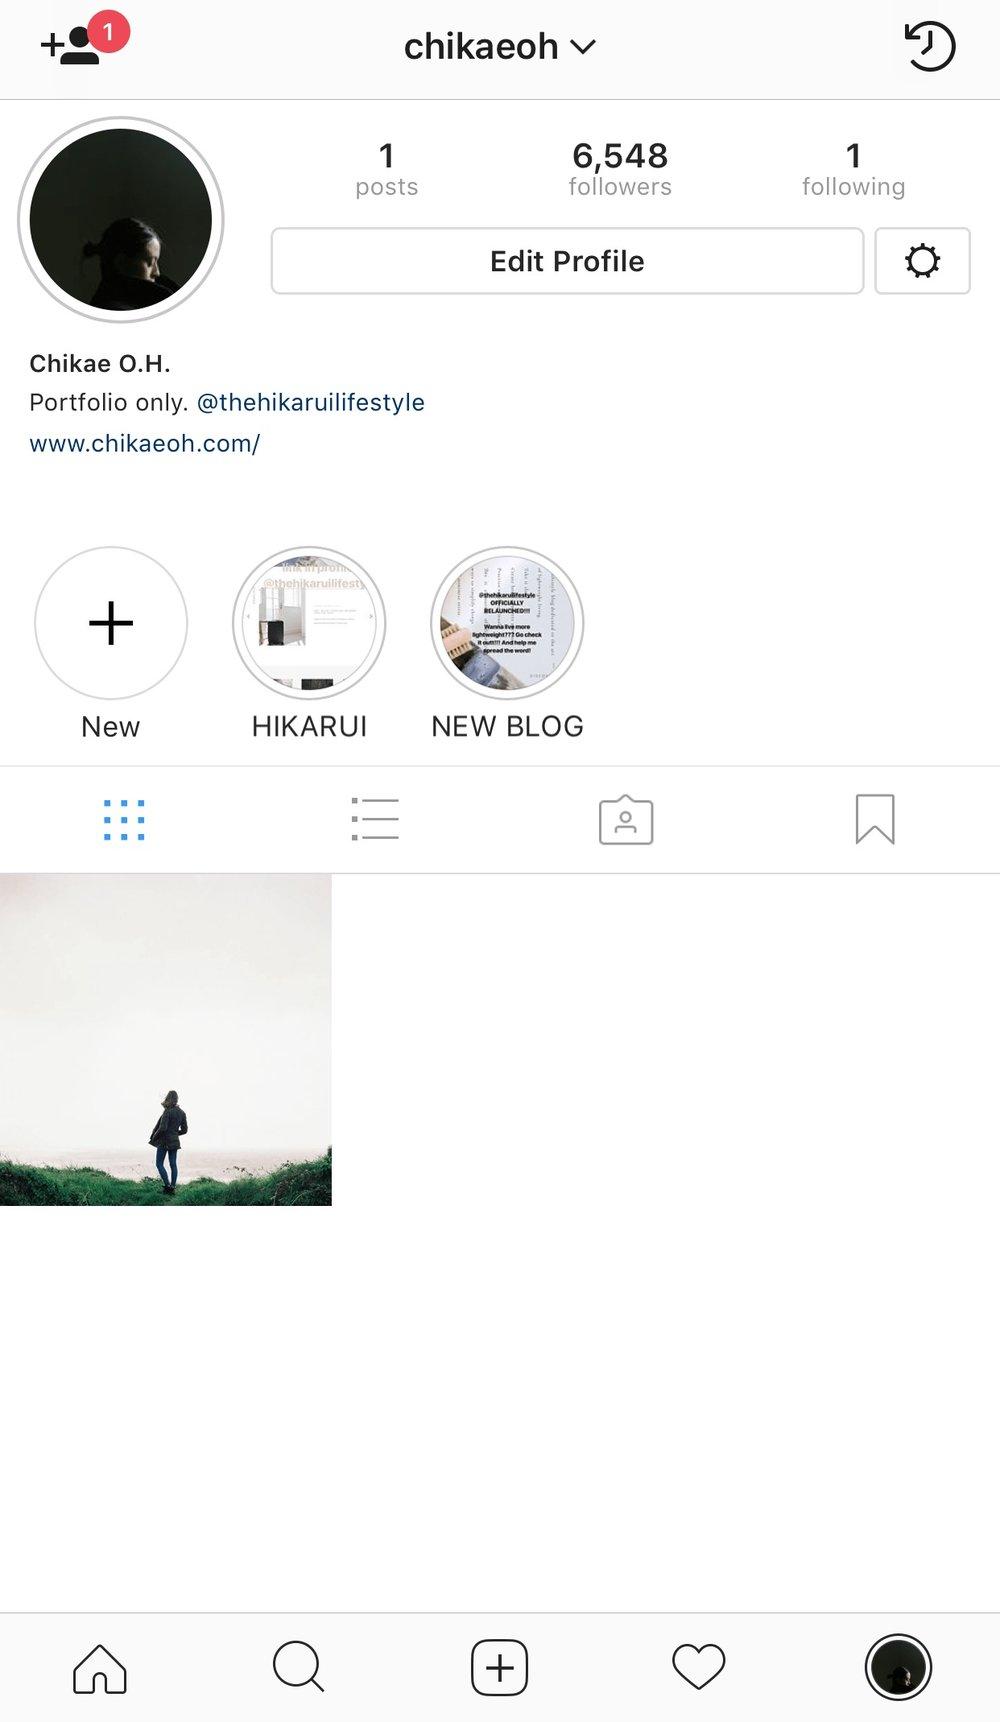 chikaeoh instagram